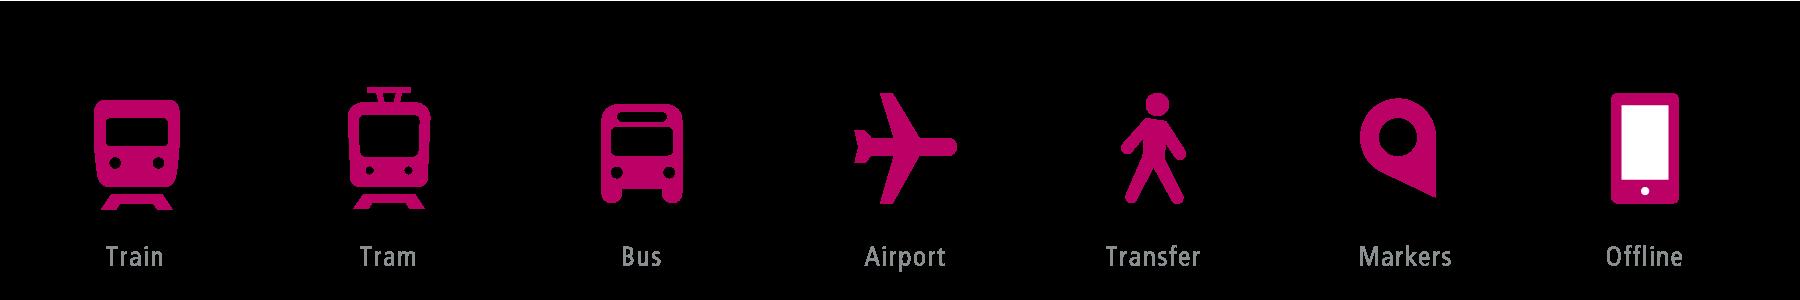 Icon of Train, Tram, Bus, Airport, Transfer, Marker, Offline